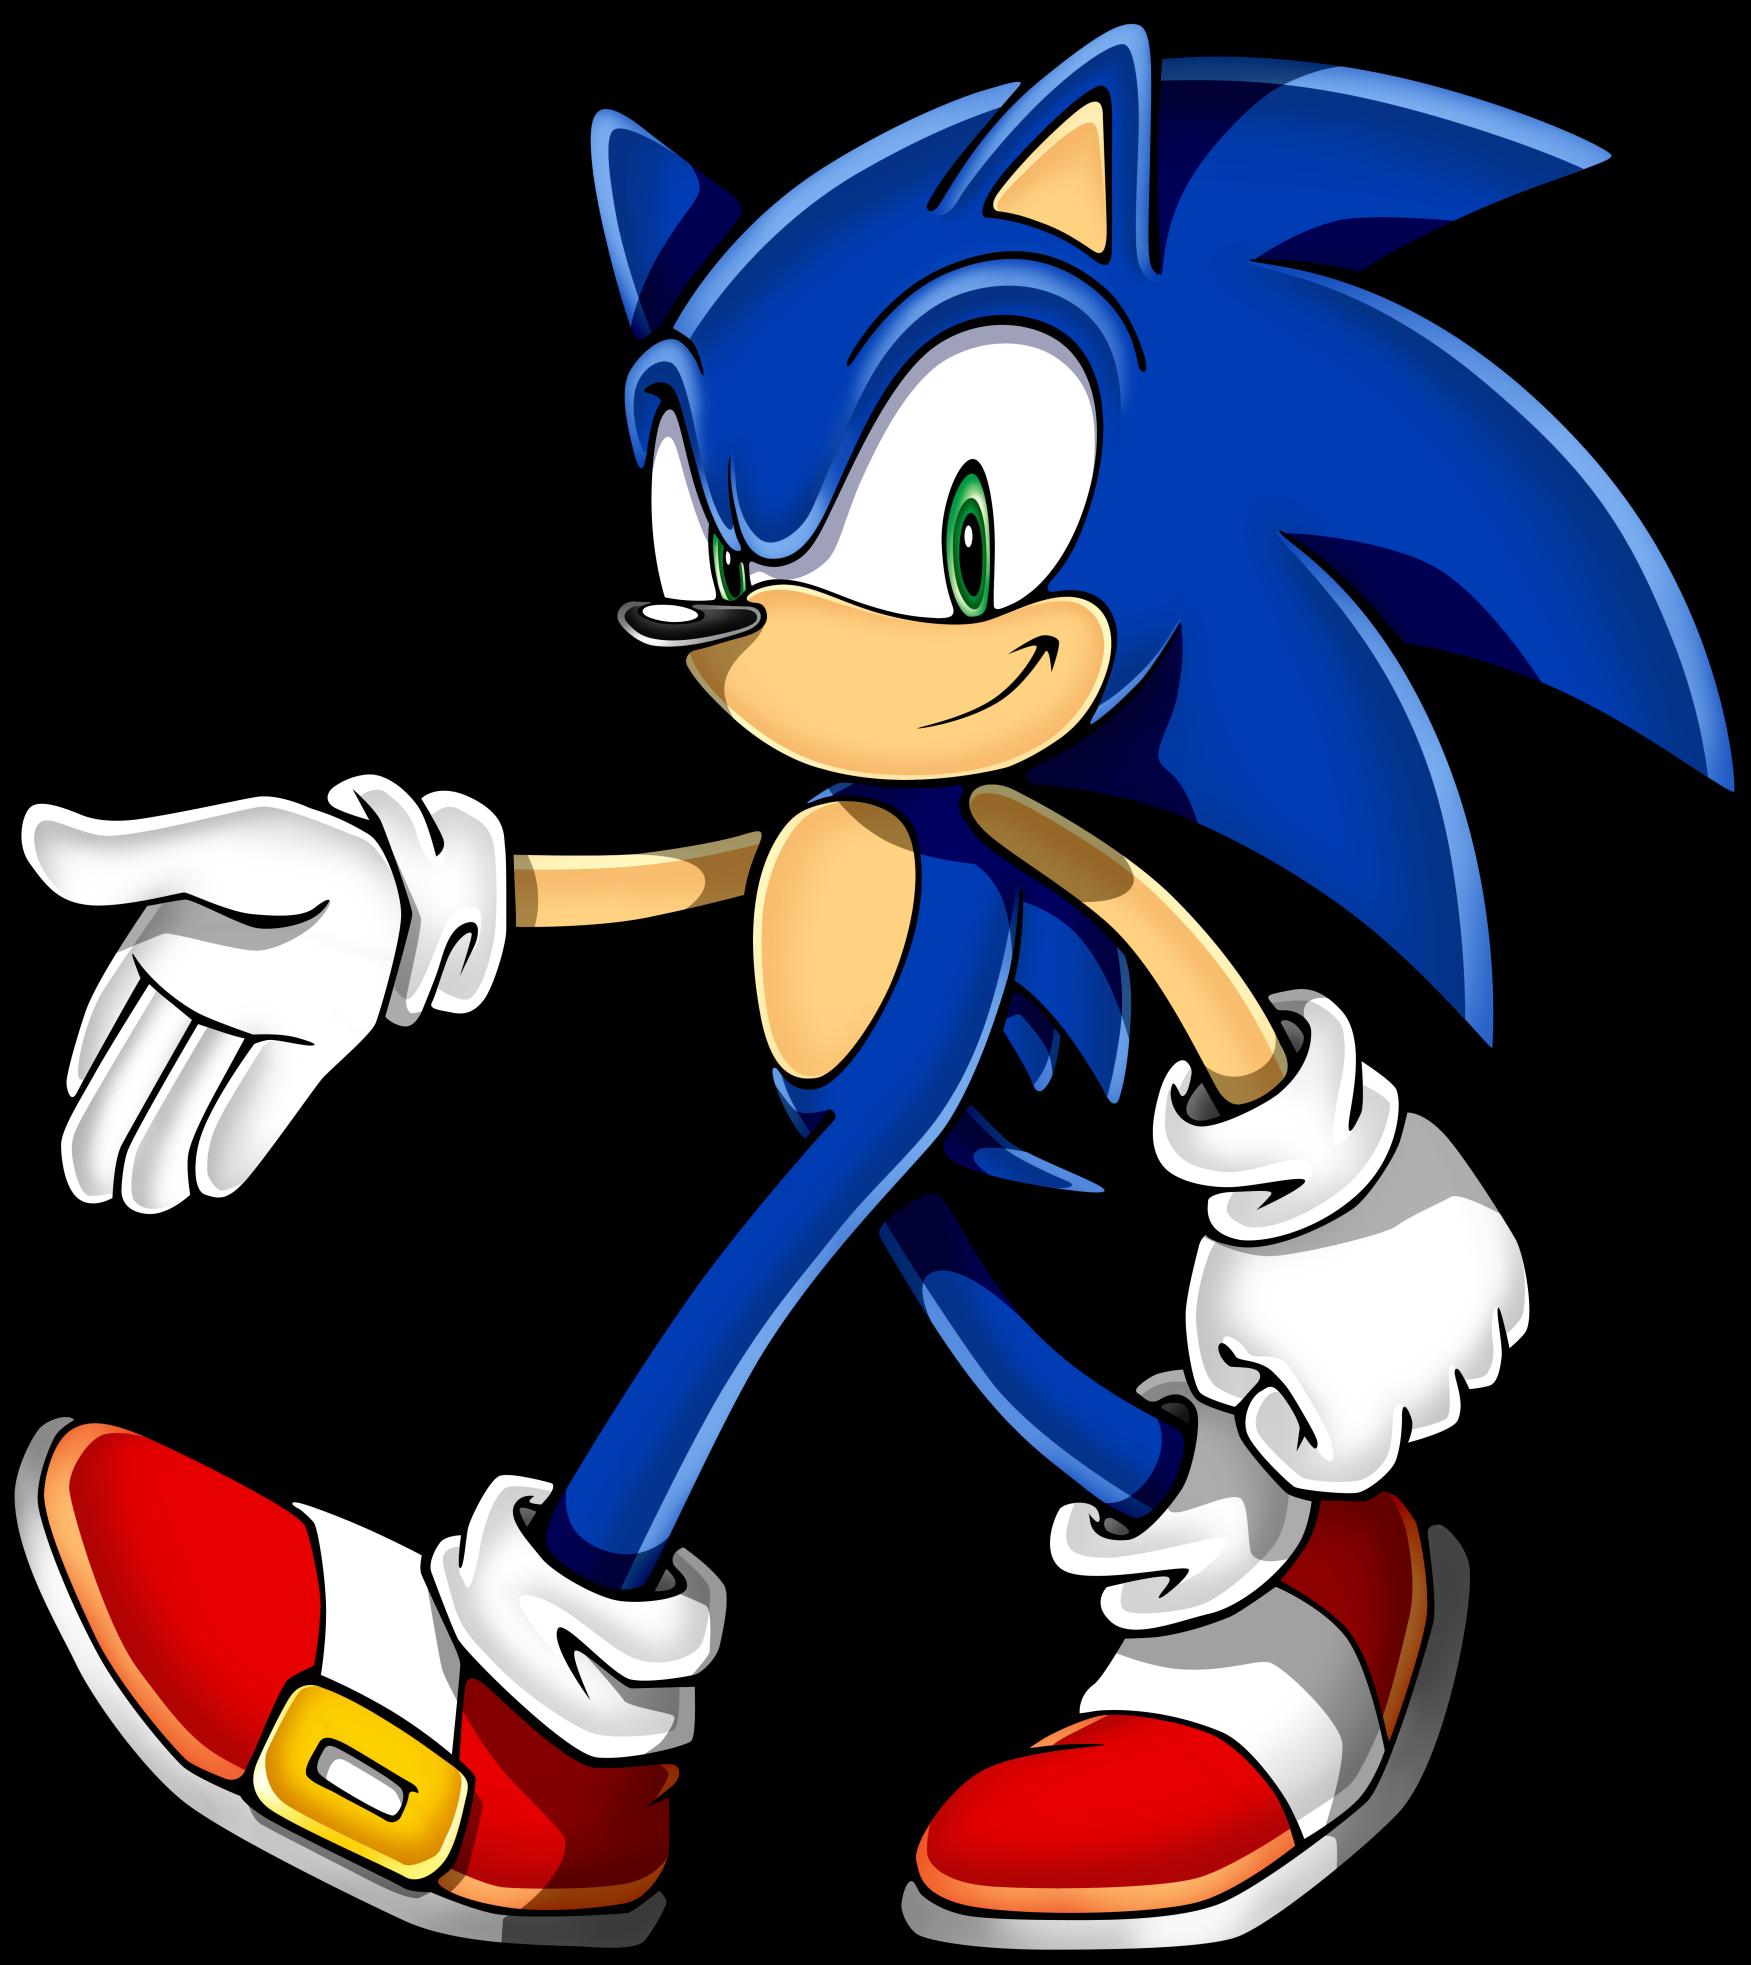 Sonic Art Assets DVD - Sonic The Hedgeho-Sonic Art Assets DVD - Sonic The Hedgehog - 2.png-4